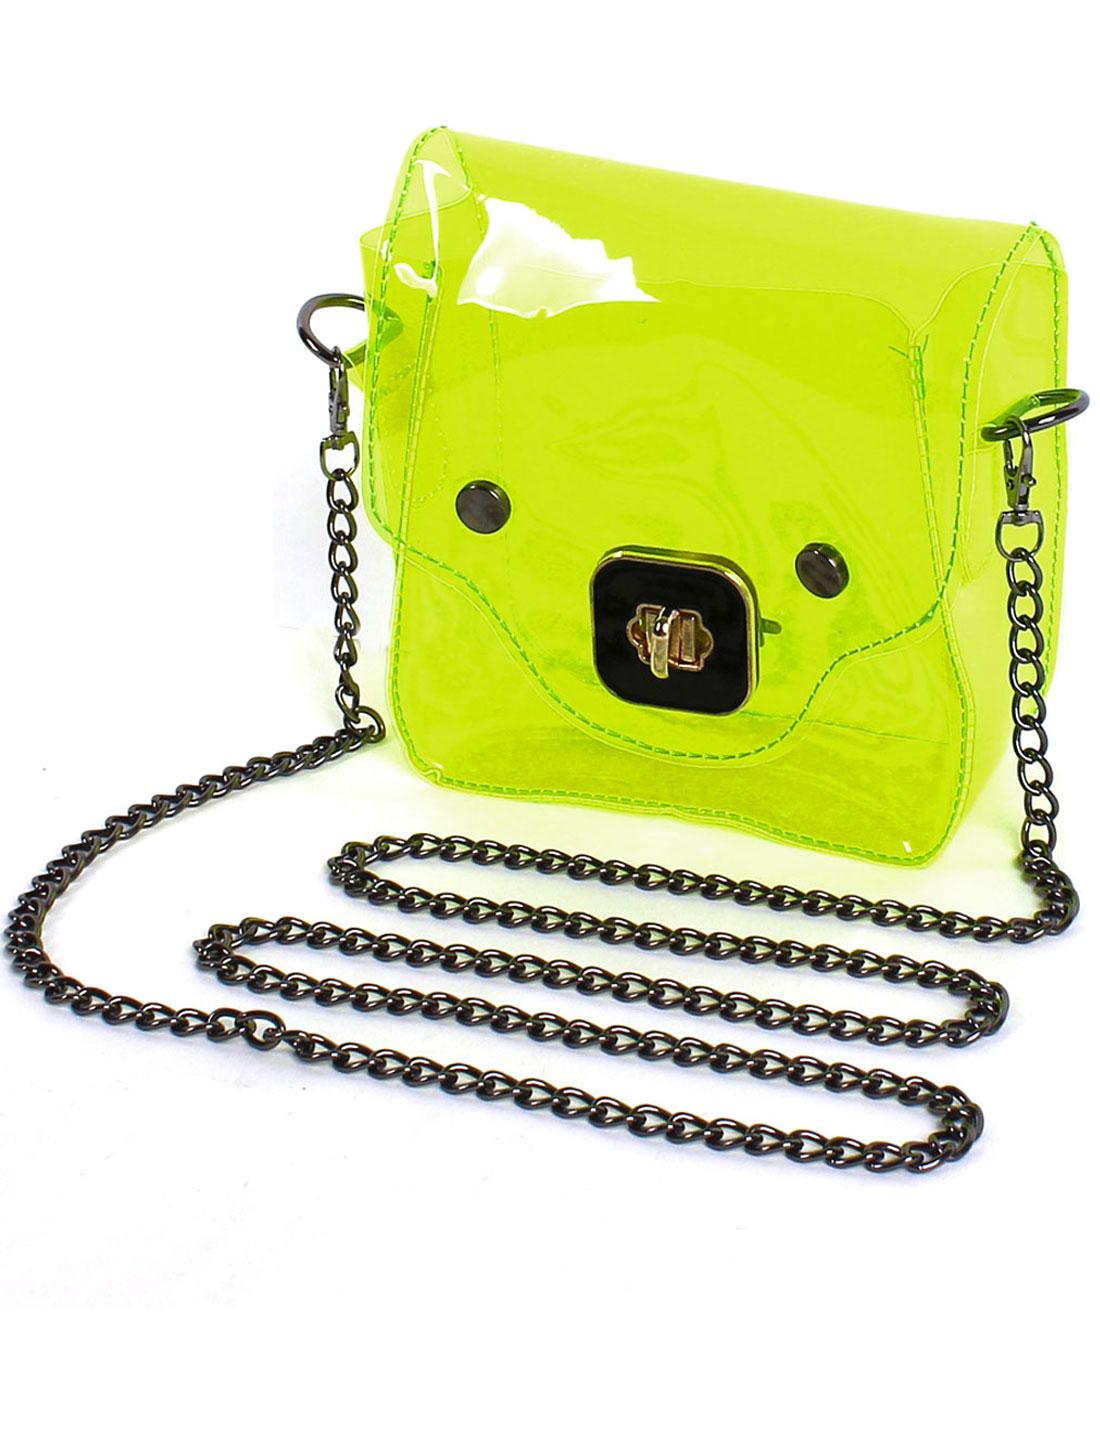 2015 Mini New Transparency Clear Cute Pig Pattern Handbag Shoulder Bag Green